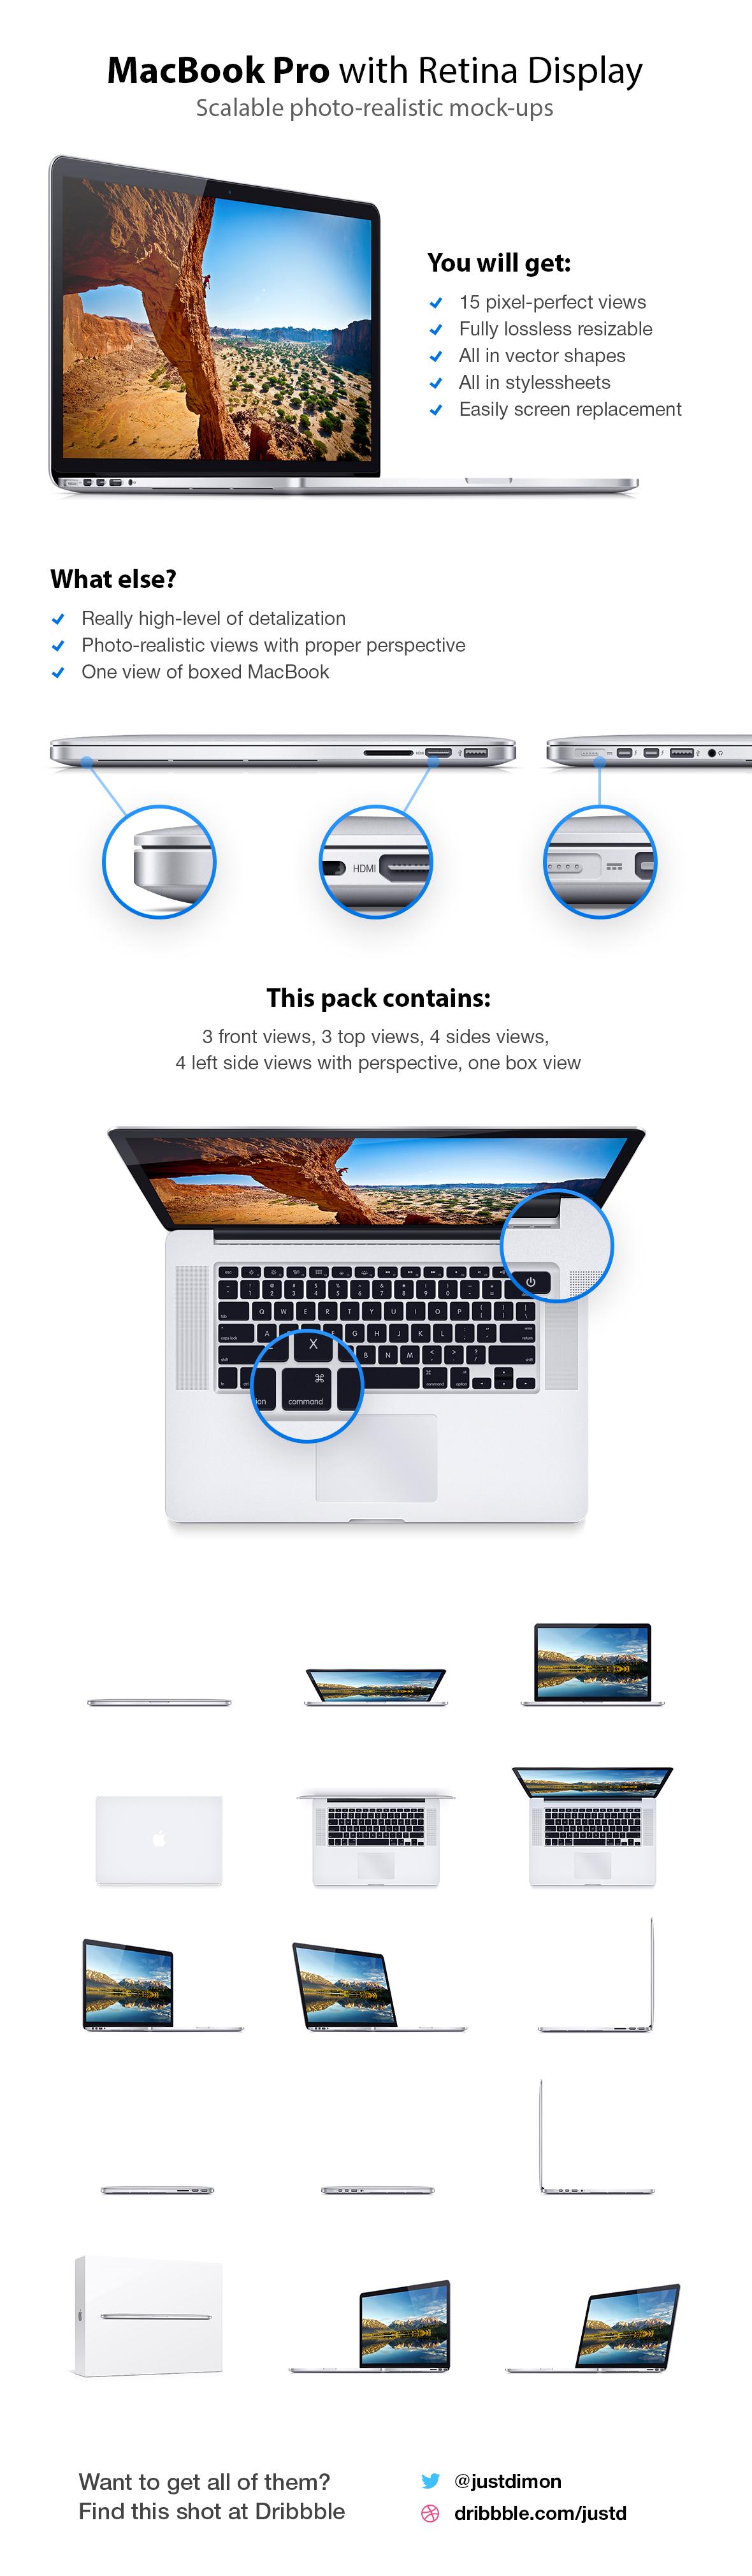 Macbook preview